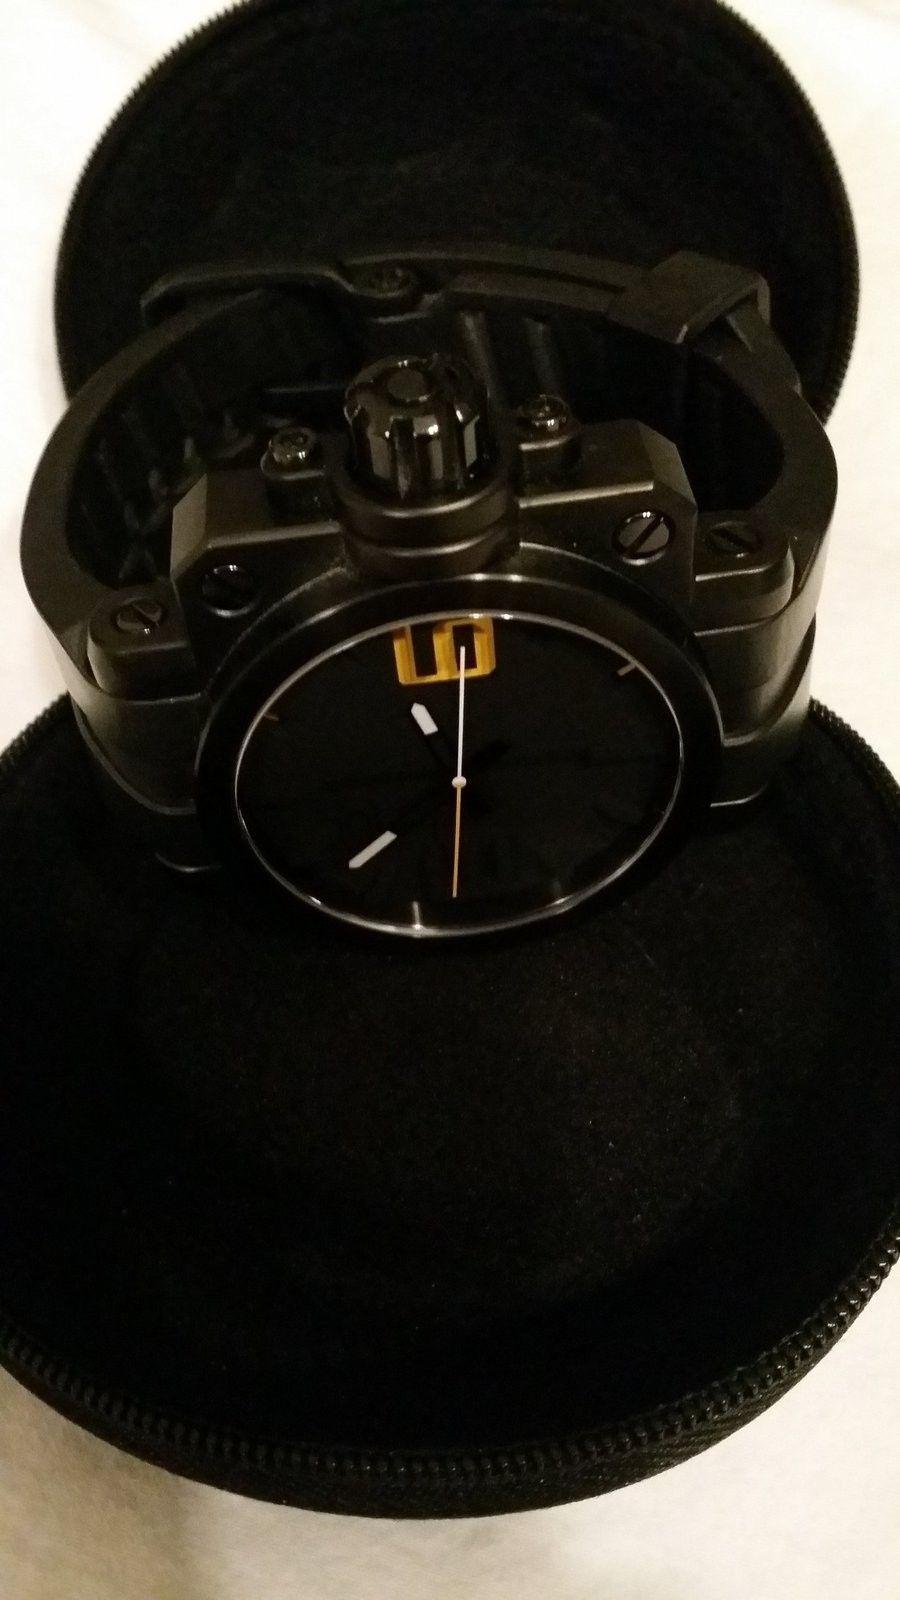 Gearbox Black/Yellow. Price drop! $250 - 20150831_202153.jpg